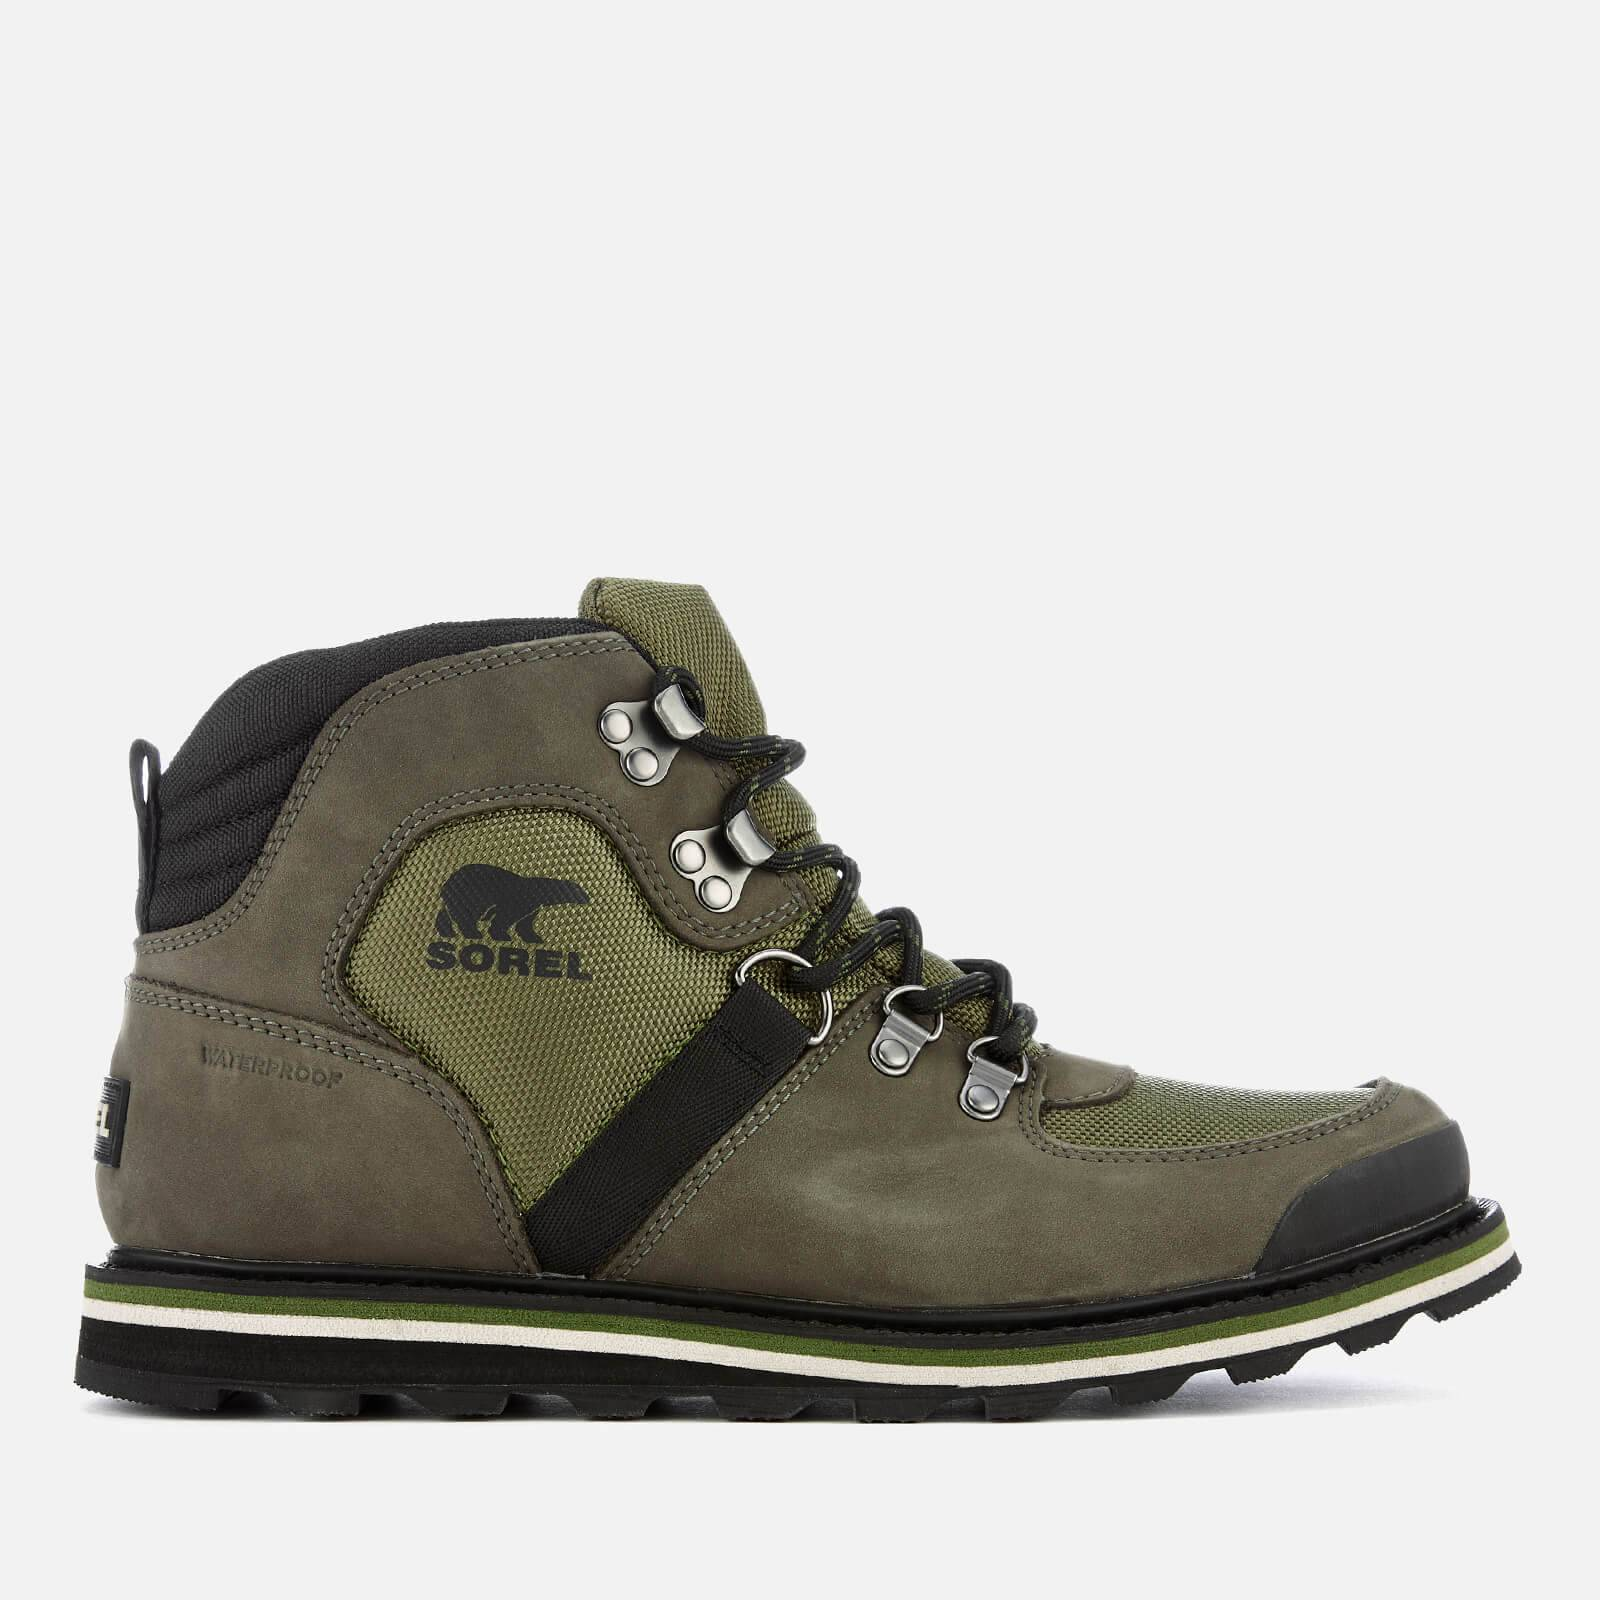 Sorel Men's Madson Sport Hiker Style Boots - Hiker Green - UK 9